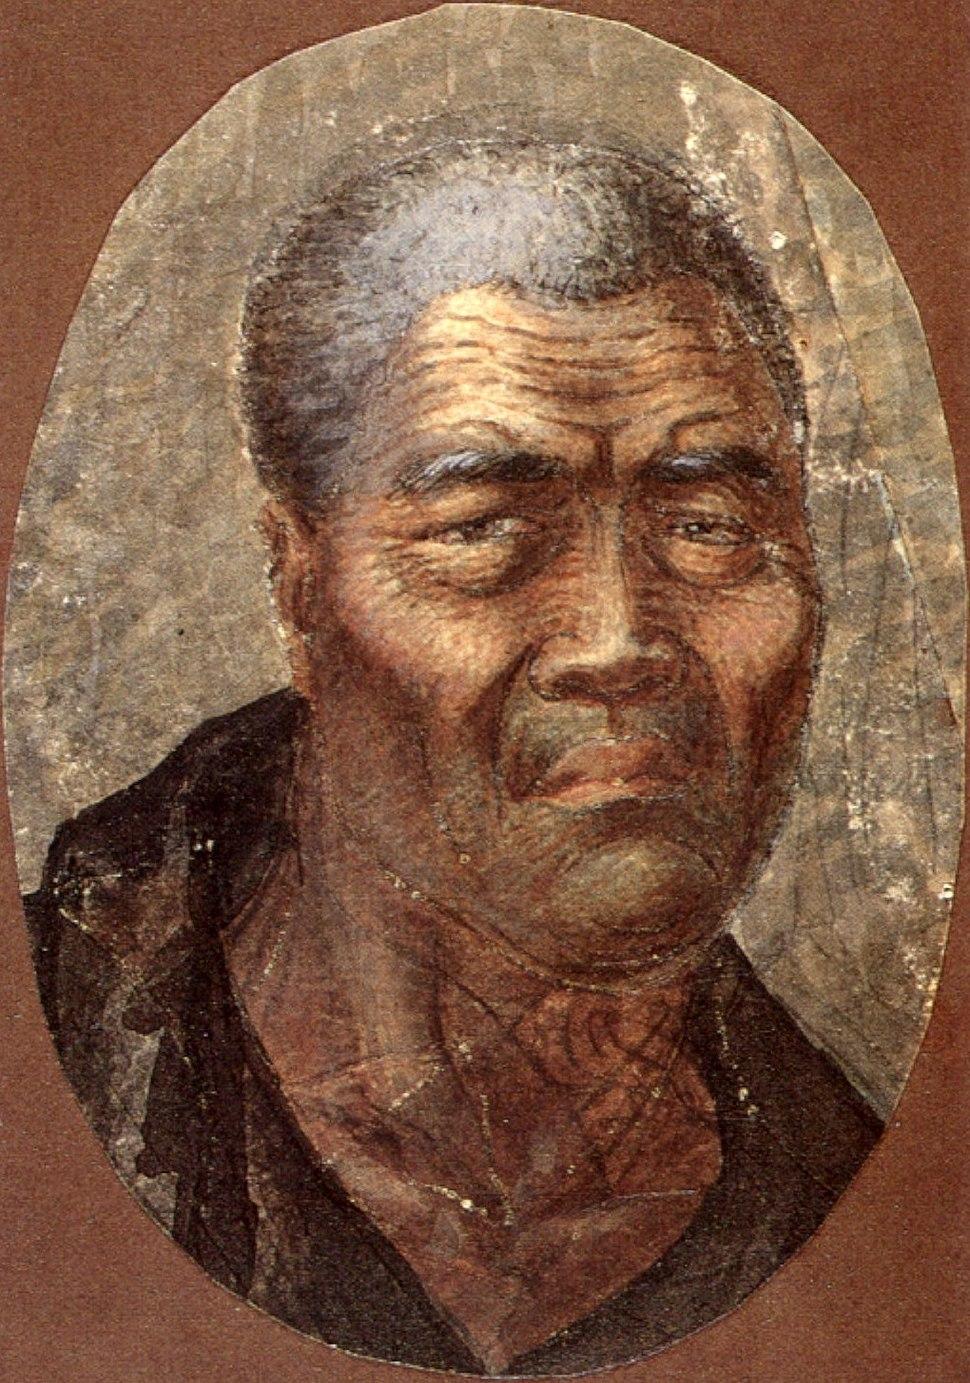 Louis Choris (1795-1828) - Kamehameha, King of the Sandwich Islands by Louis Choris, (Russian), pen and watercolor